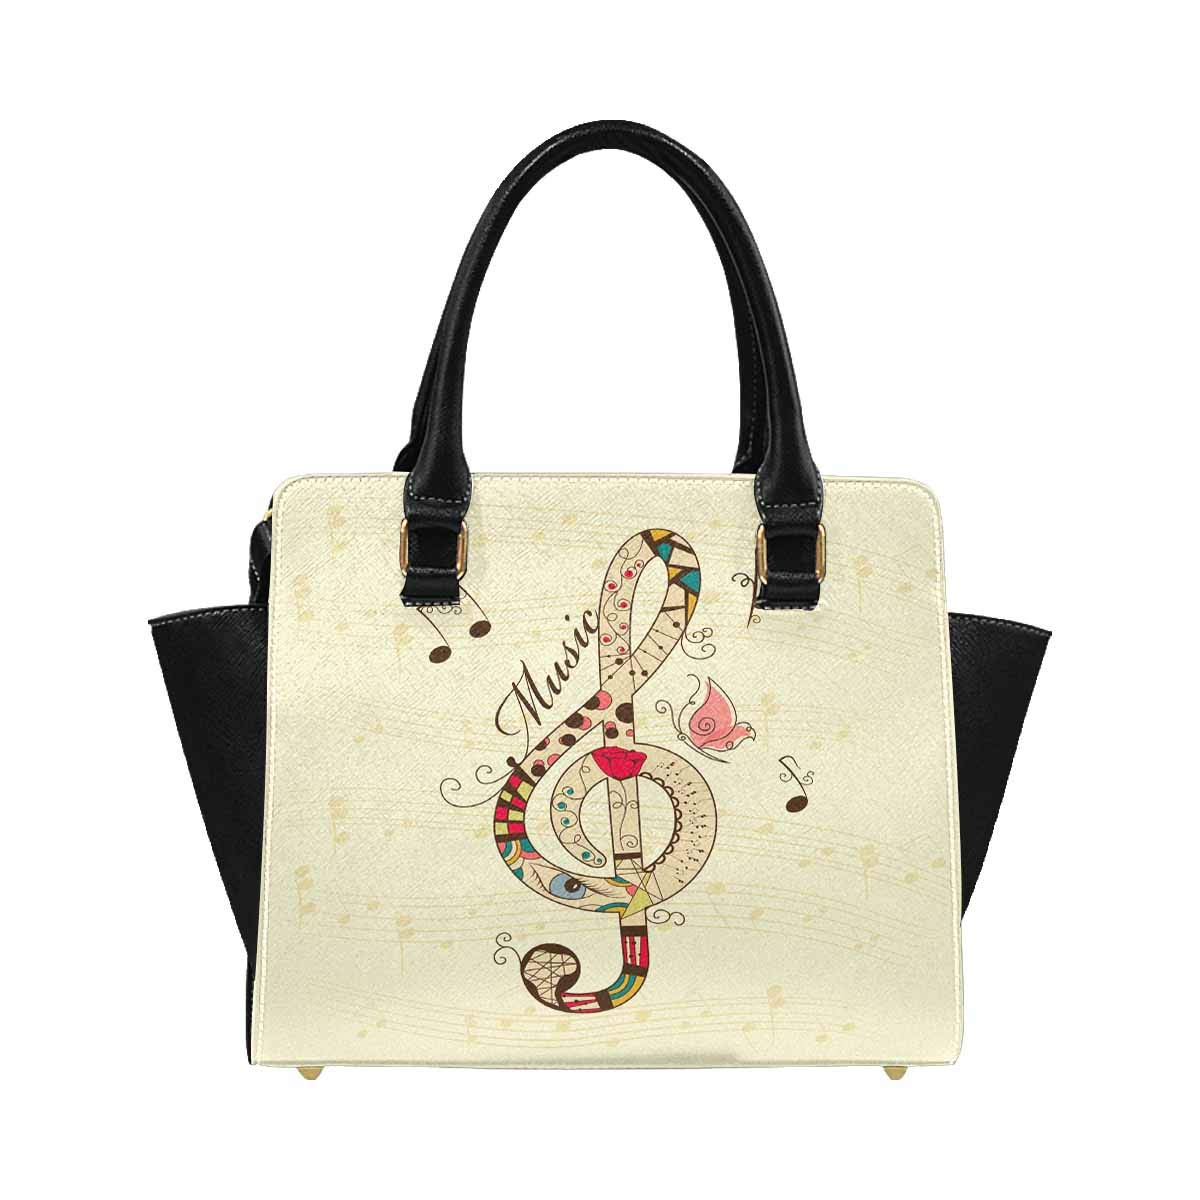 InterestPrint Womens Musical Signs Rivet Shoulder Handbag Shoulder Bags